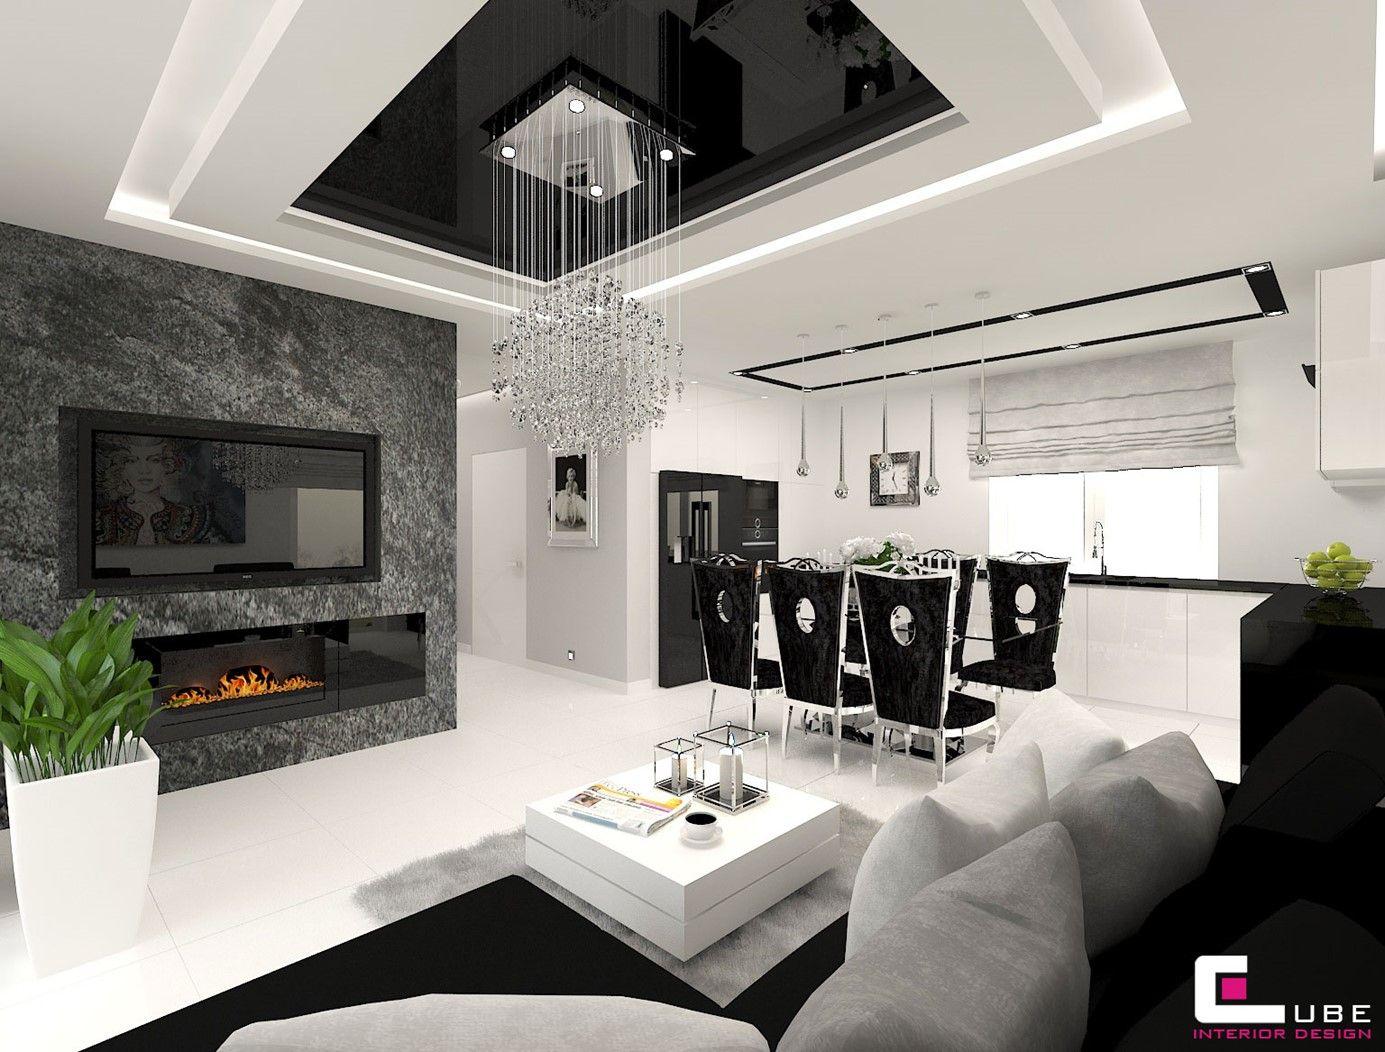 Salon Z Kuchnia Aranzacje Inspiracje I Pomysly Na Modny Wystroj 2020 Modern Luxury Bedroom Luxurious Bedrooms Large Living Room